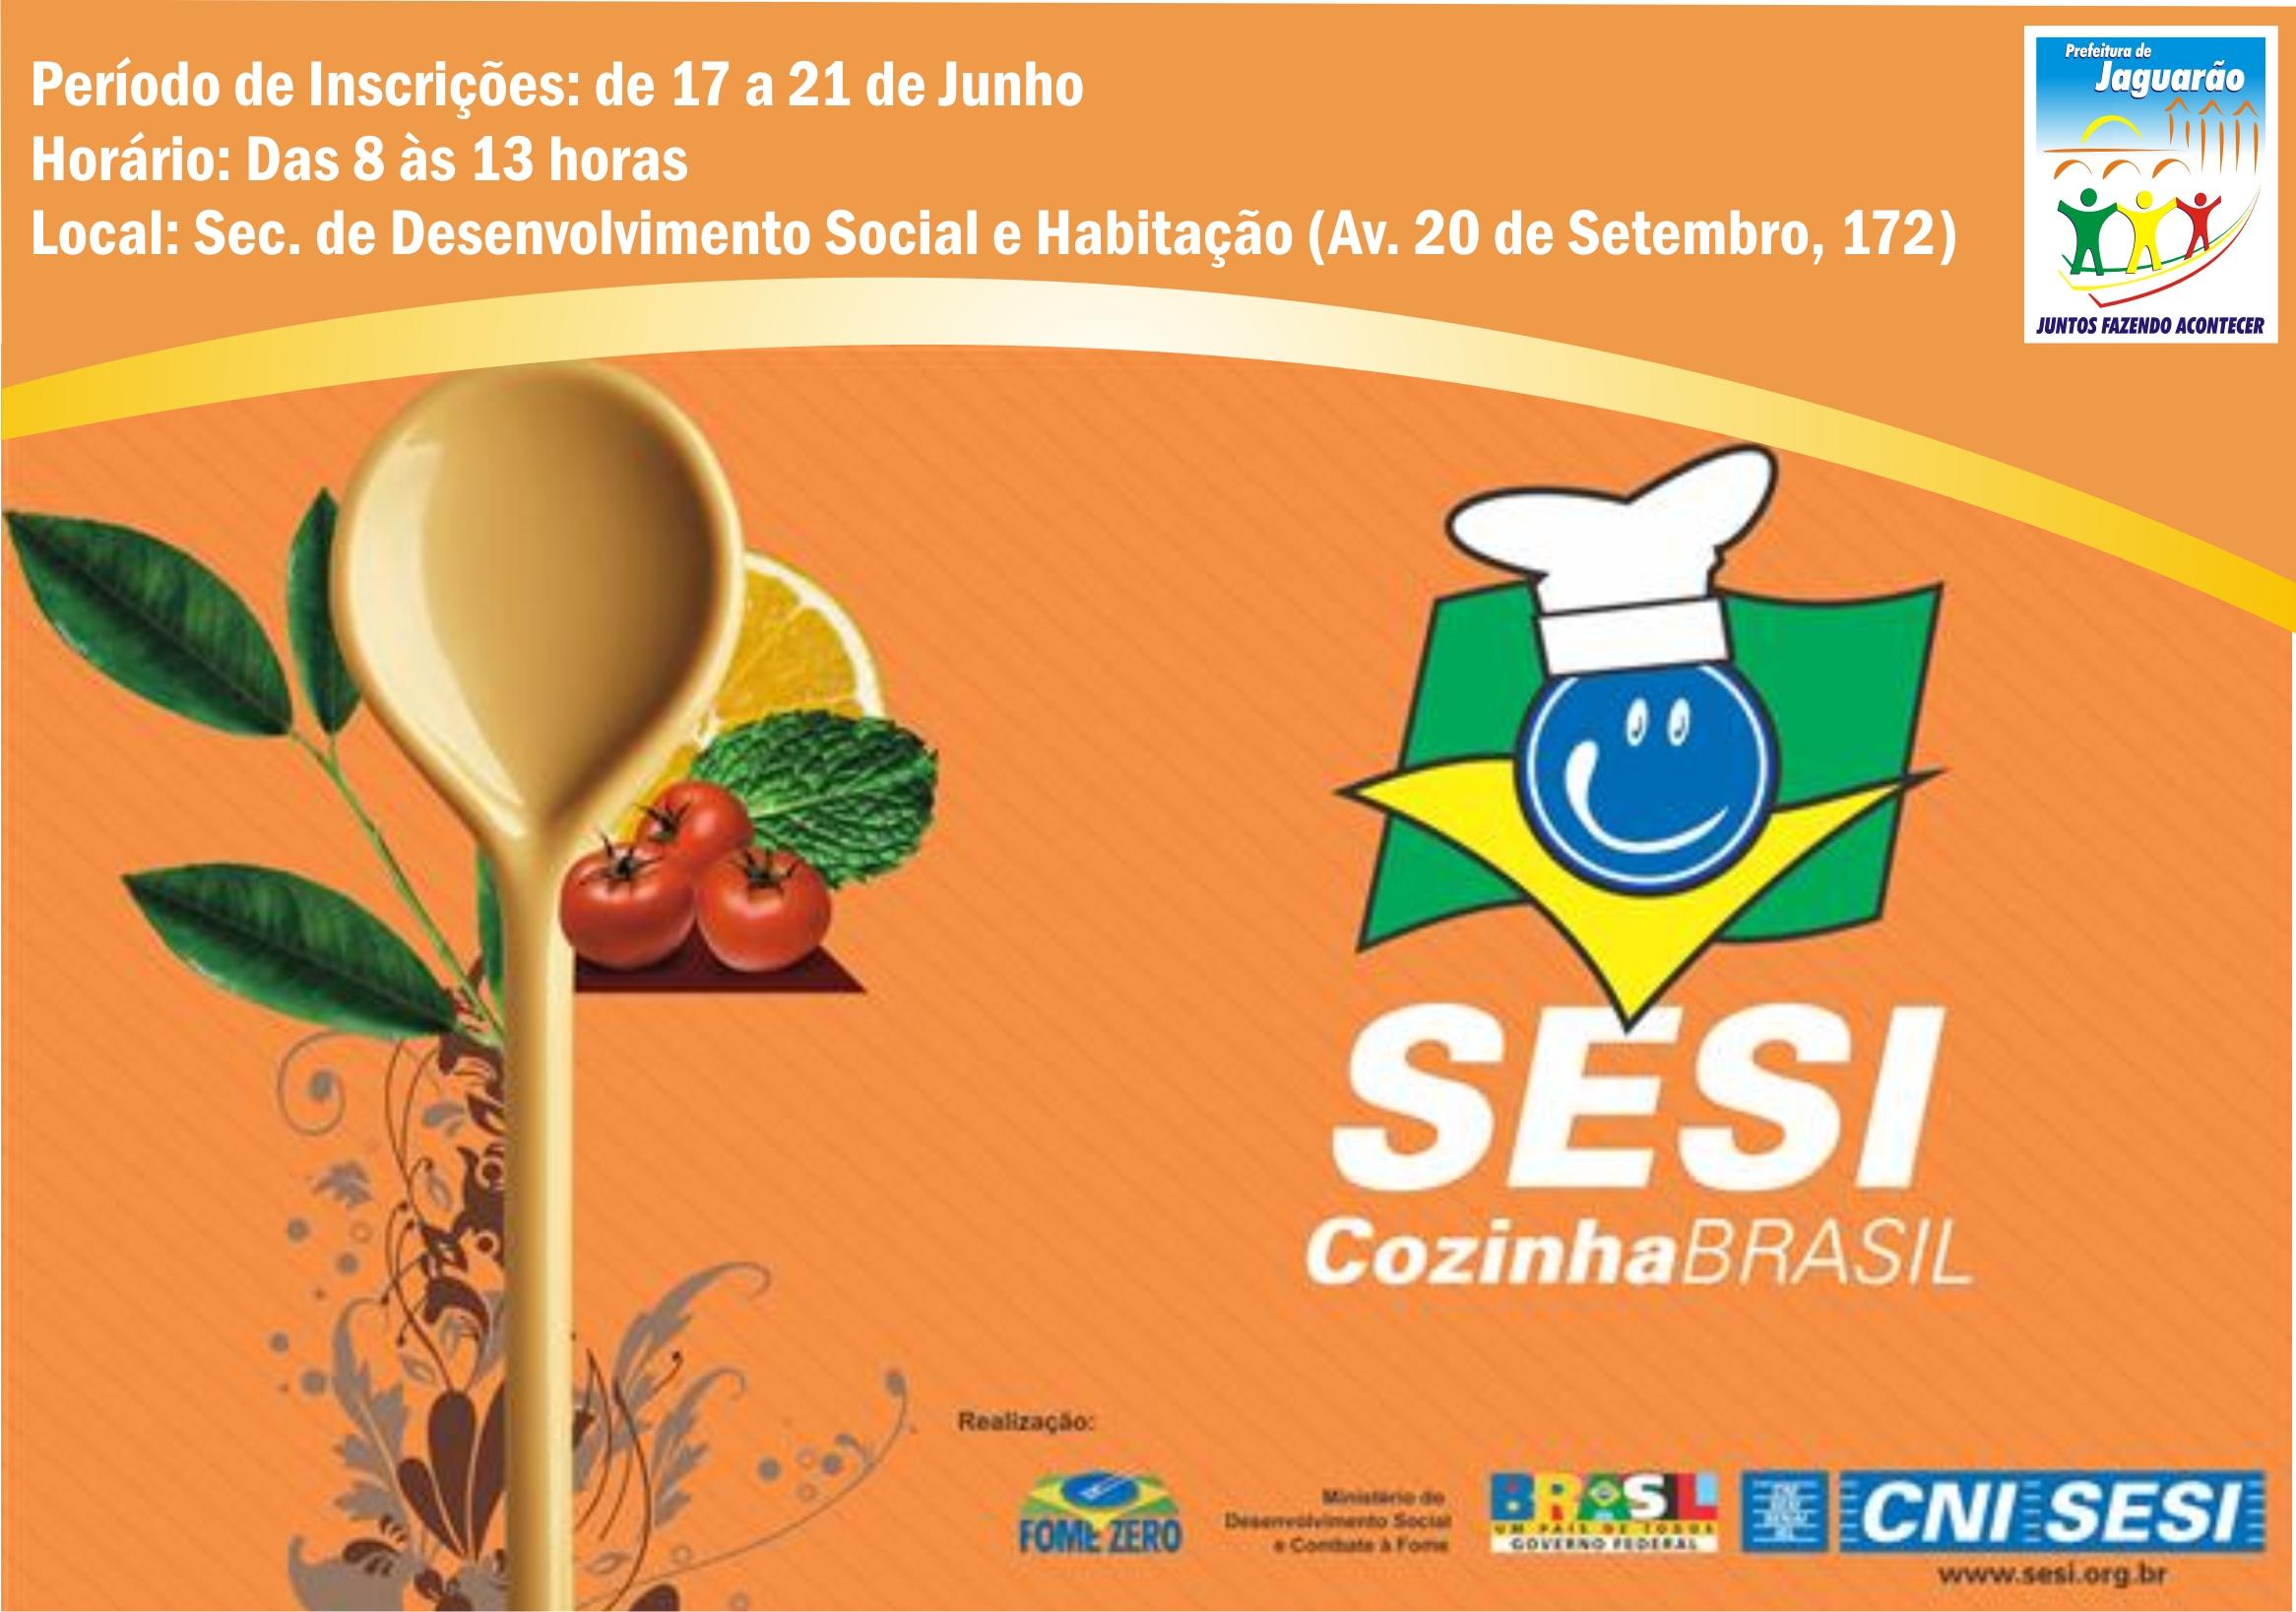 Cozinha Brasil Cartaz #C2A709 2332 1637